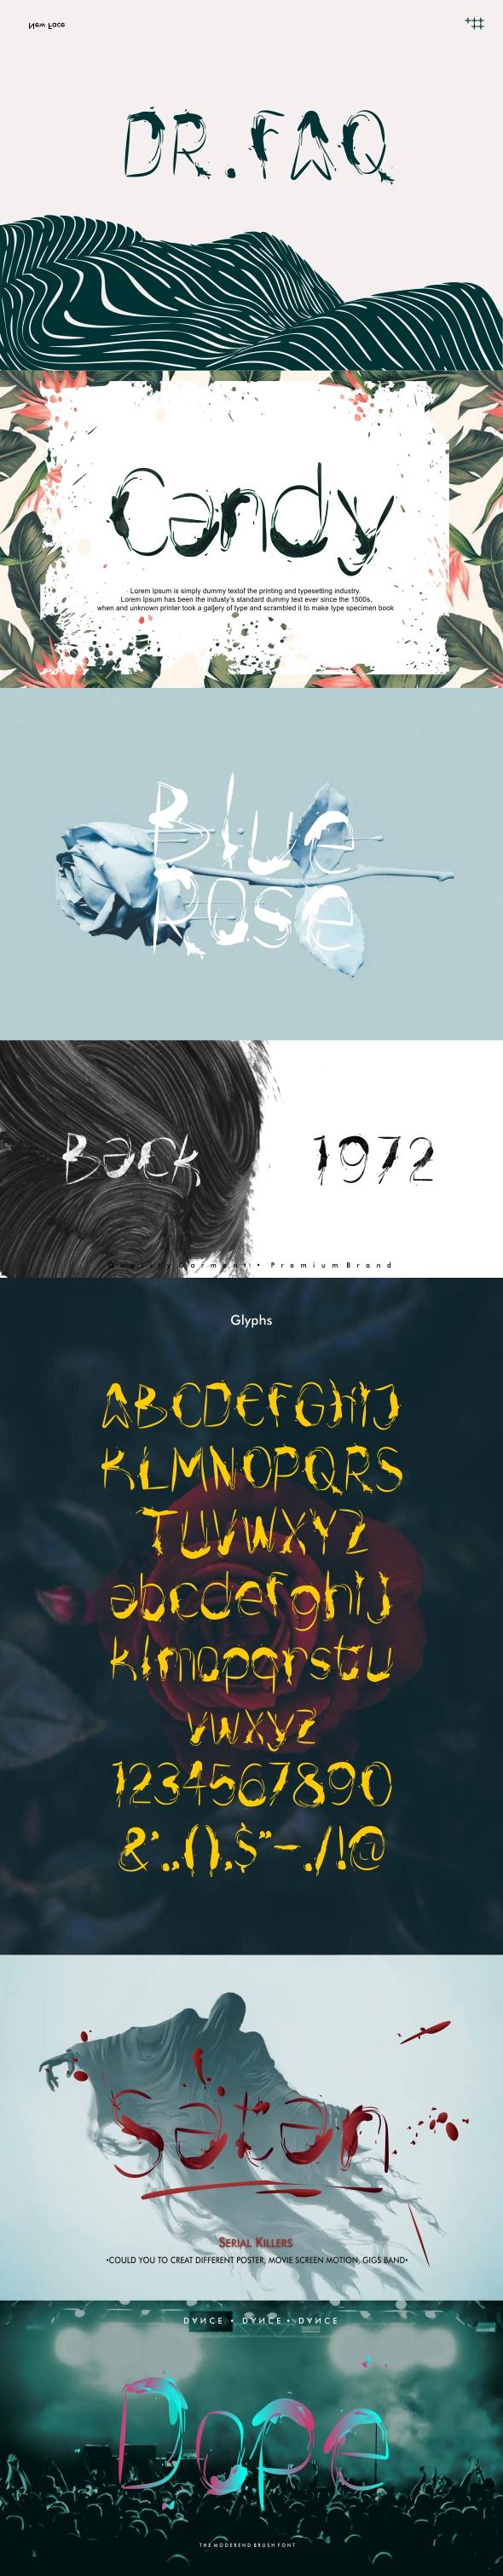 Drfaq font - Cool Fonts